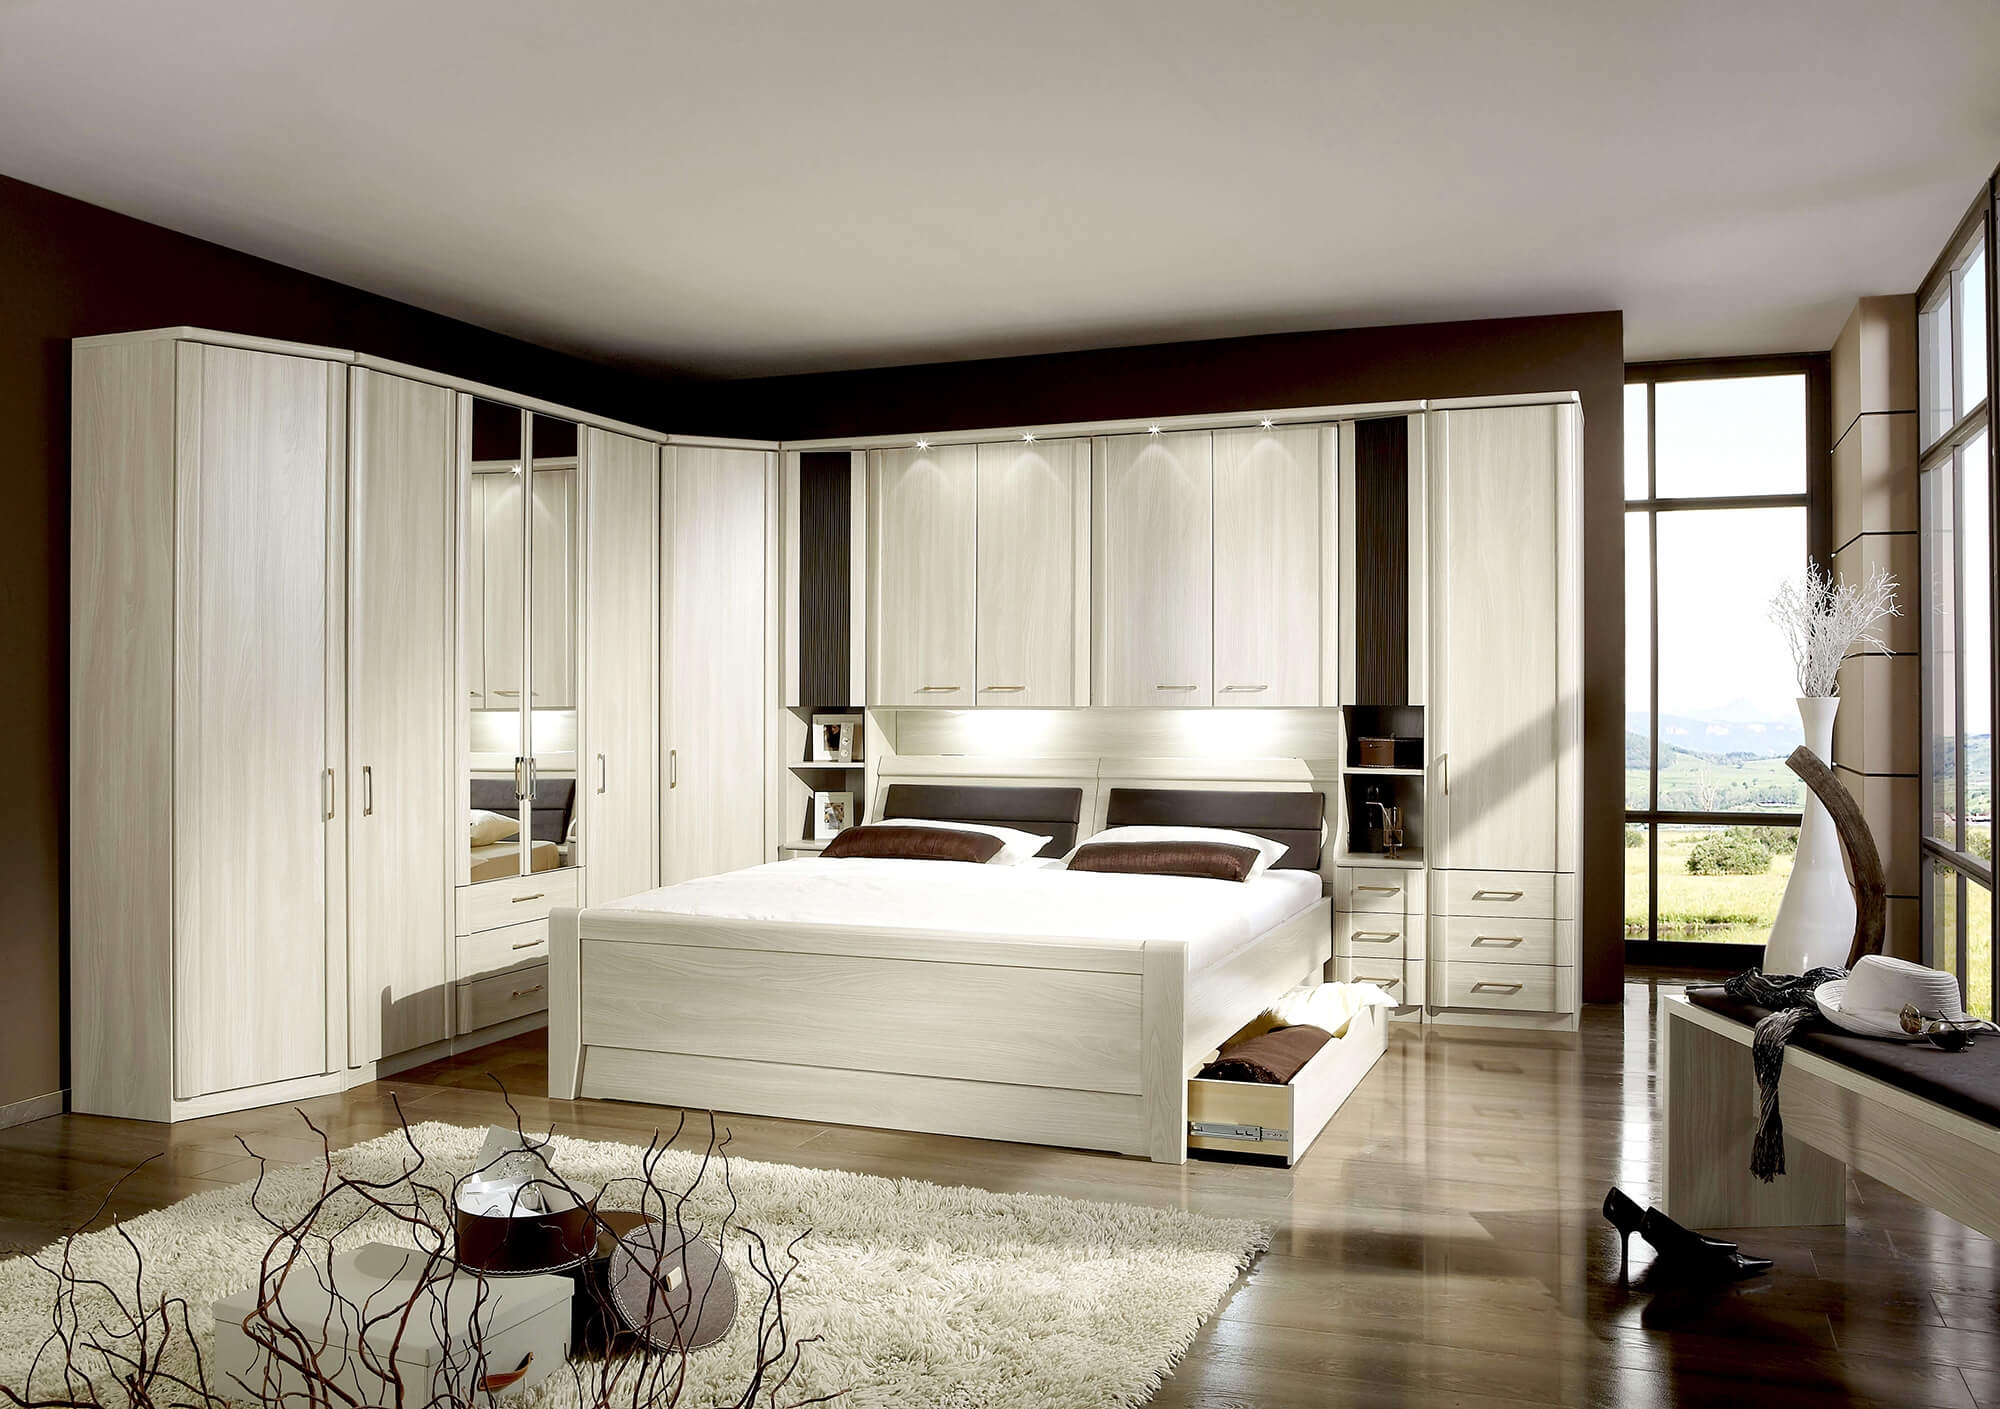 slaapkamer luxor bed 160x200 2 nachttafels bovenkasten inloopkast kommode kledingkast